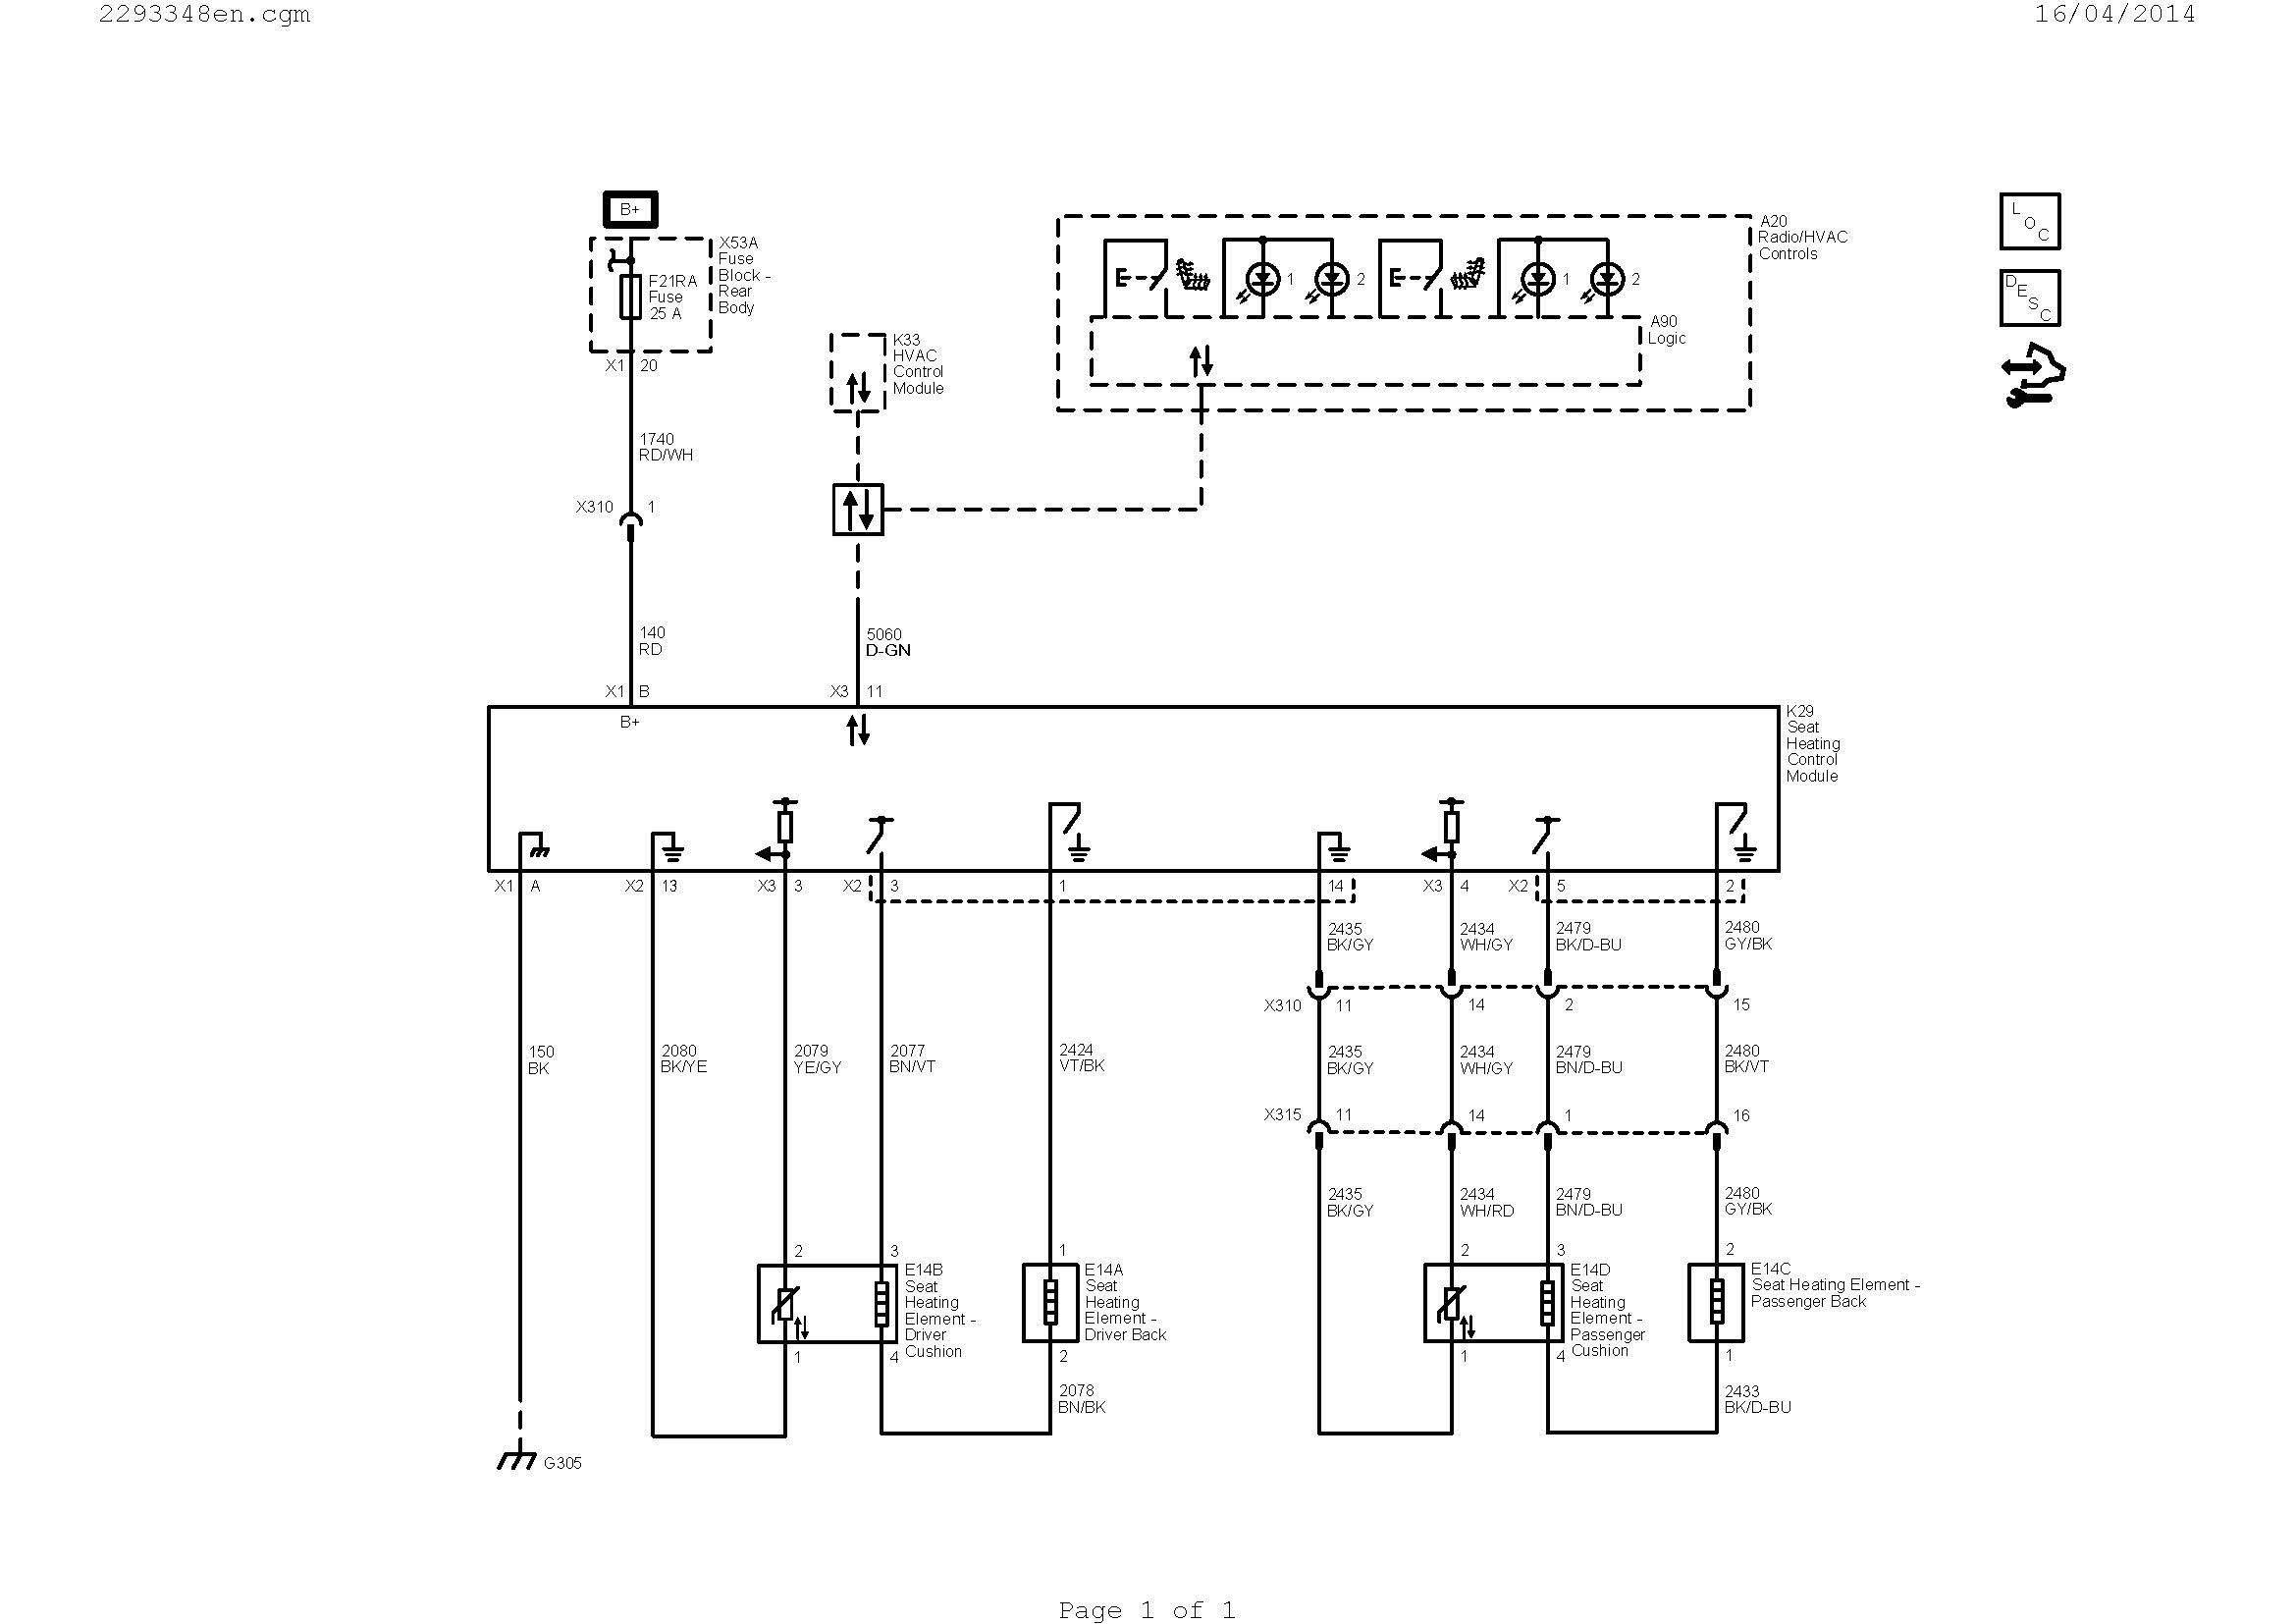 hight resolution of c70 wiring diagram wiring diagrams rh 42 crocodilecruisedarwin com volvo v70 wiring diagram 2004 volvo v70 wiring diagram 1998